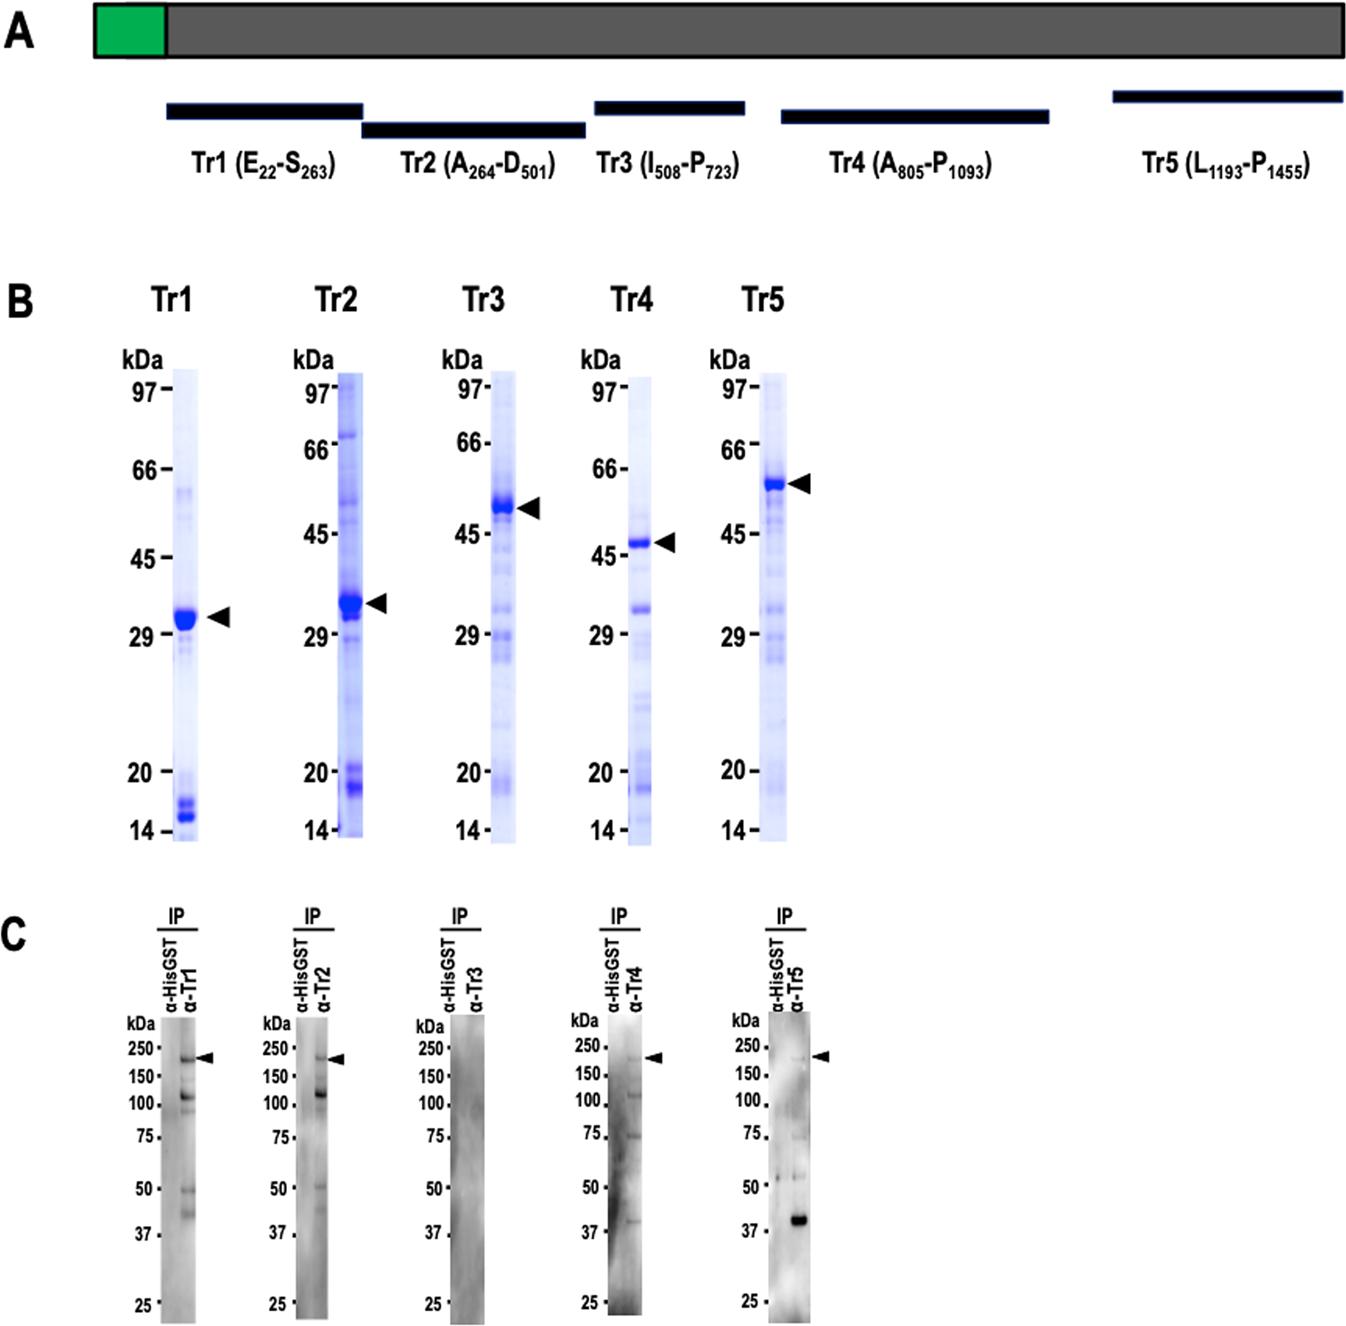 PfMSA180 is a novel Plasmodium falciparum vaccine antigen